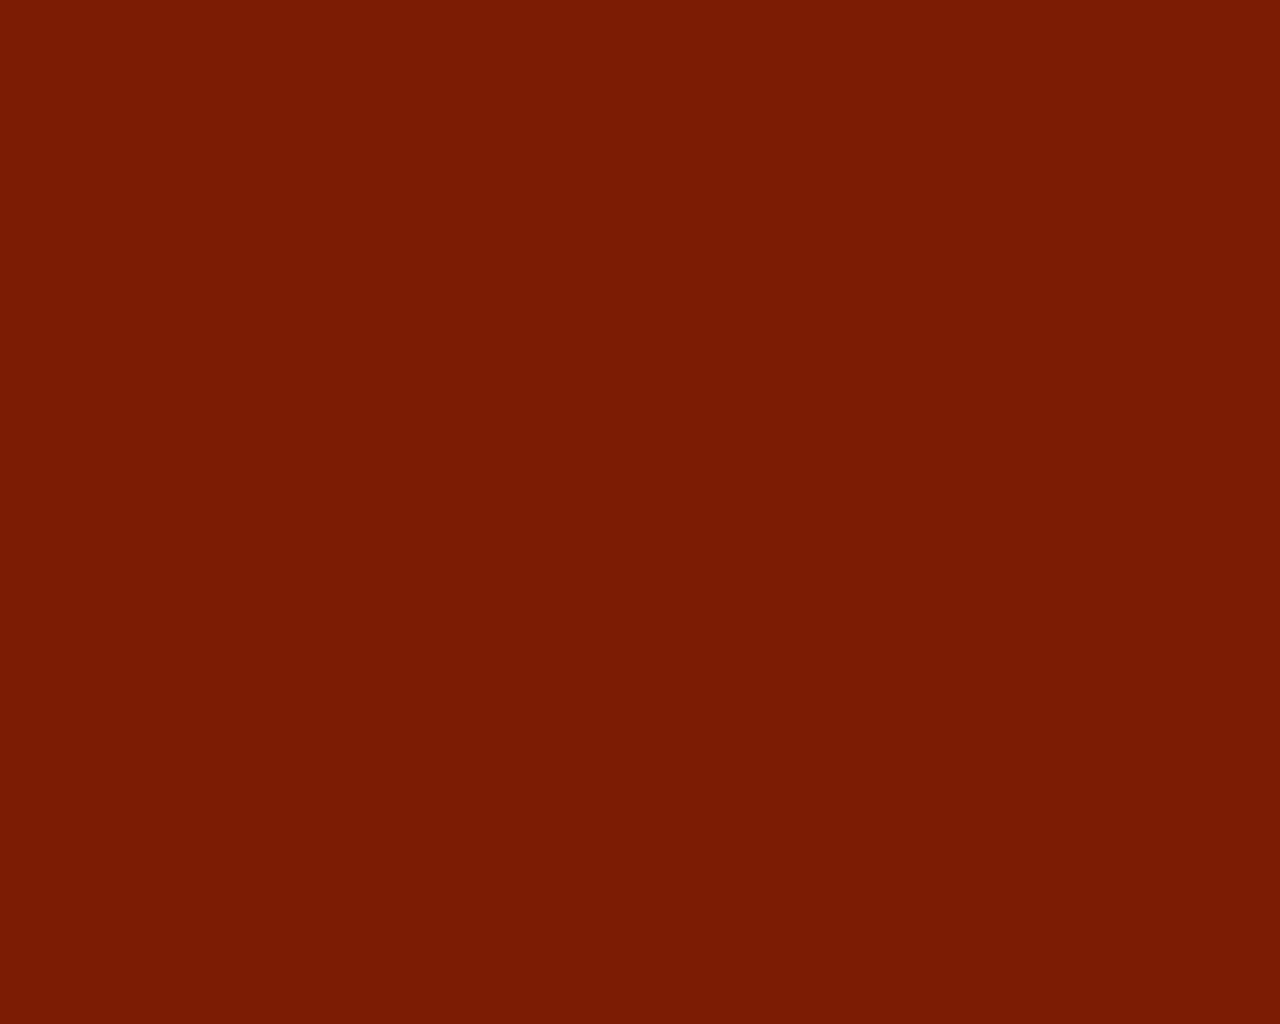 1280x1024 Kenyan Copper Solid Color Background